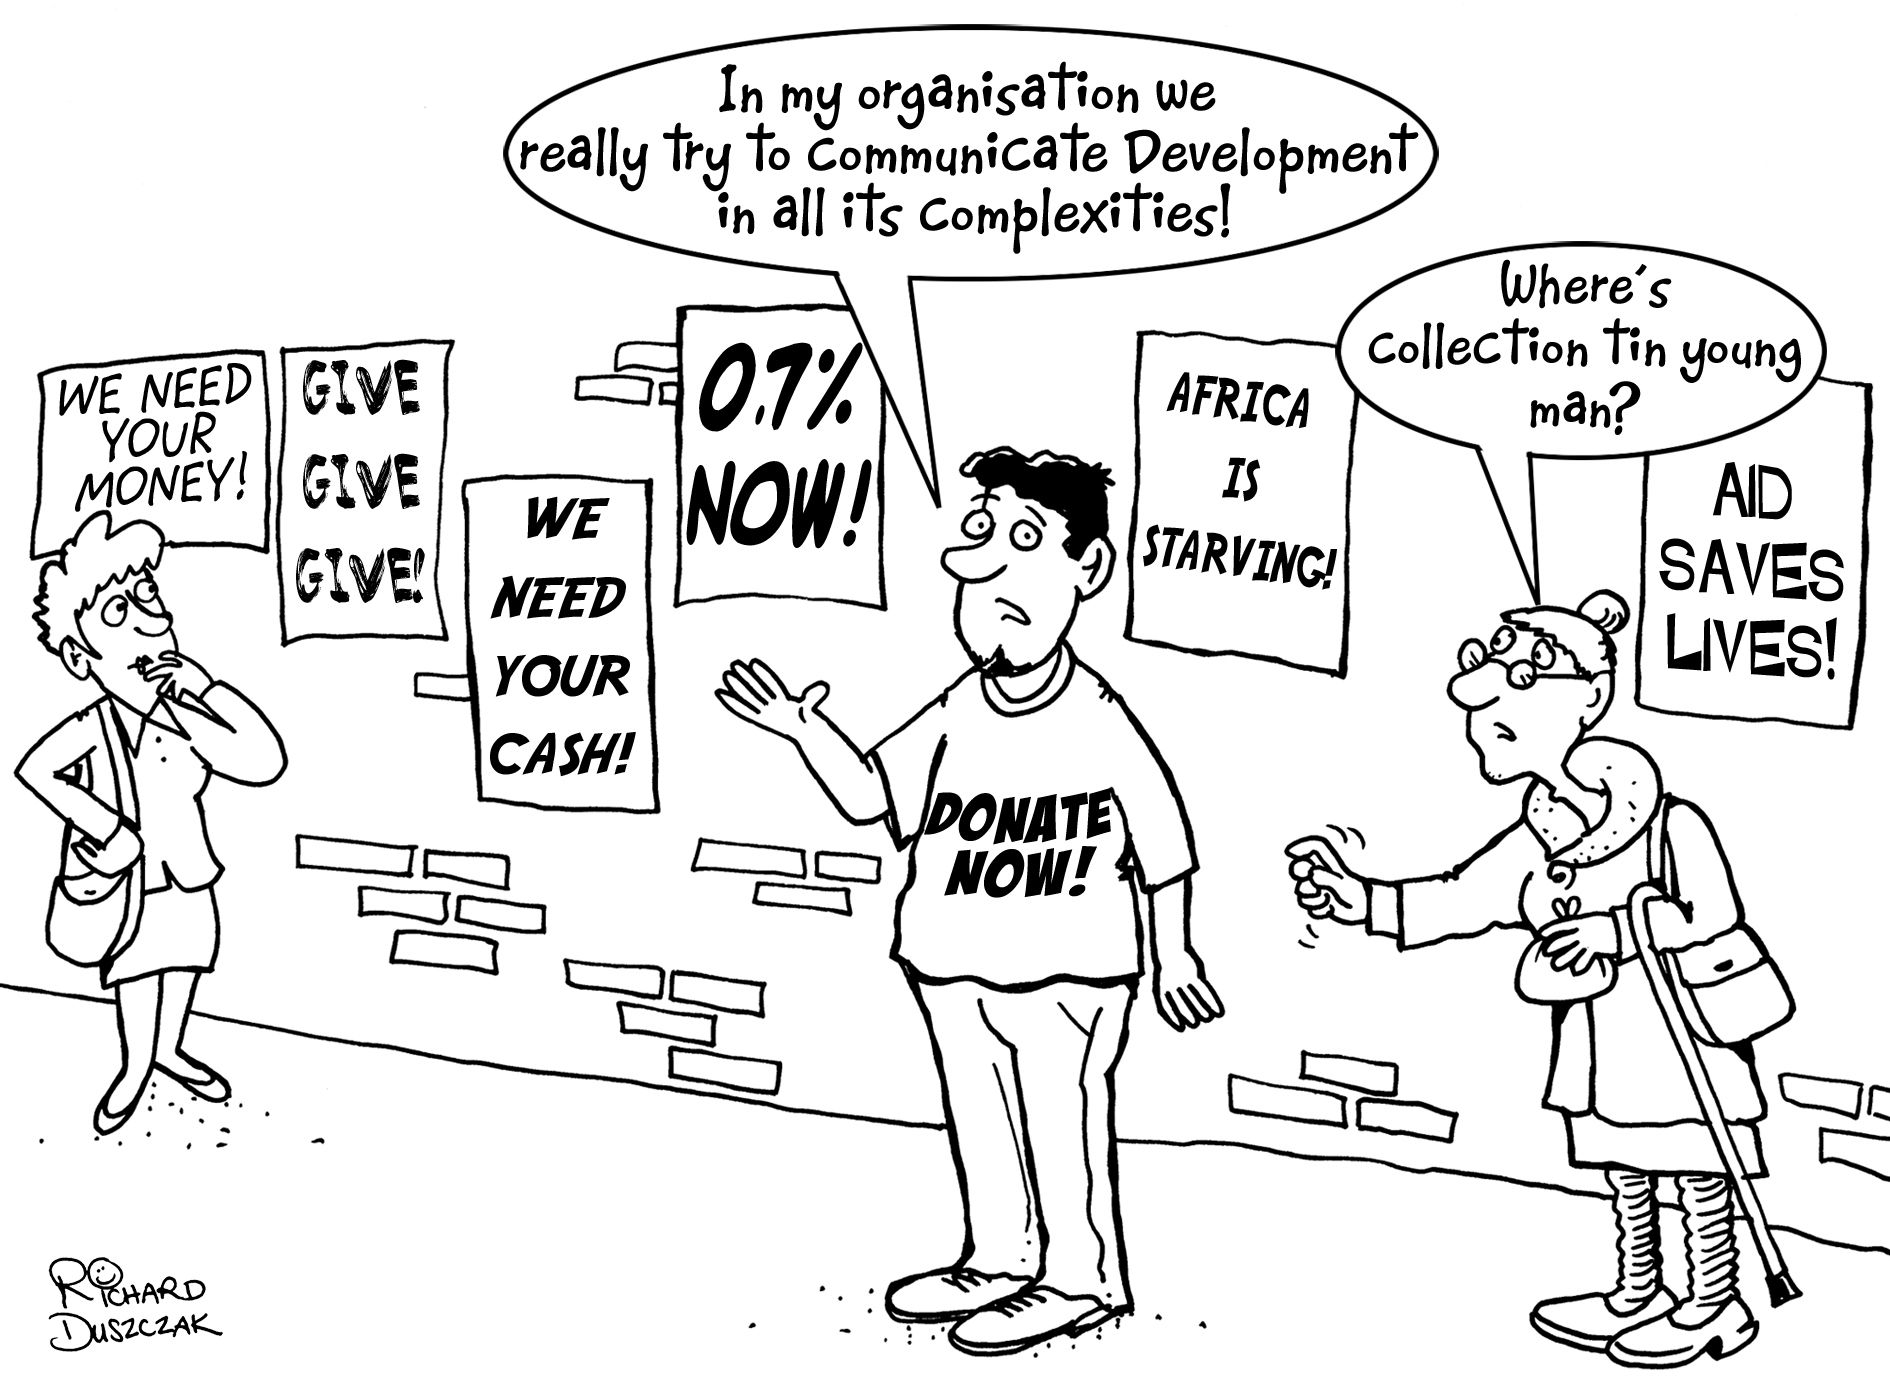 Using Cartoons To Communicate Development